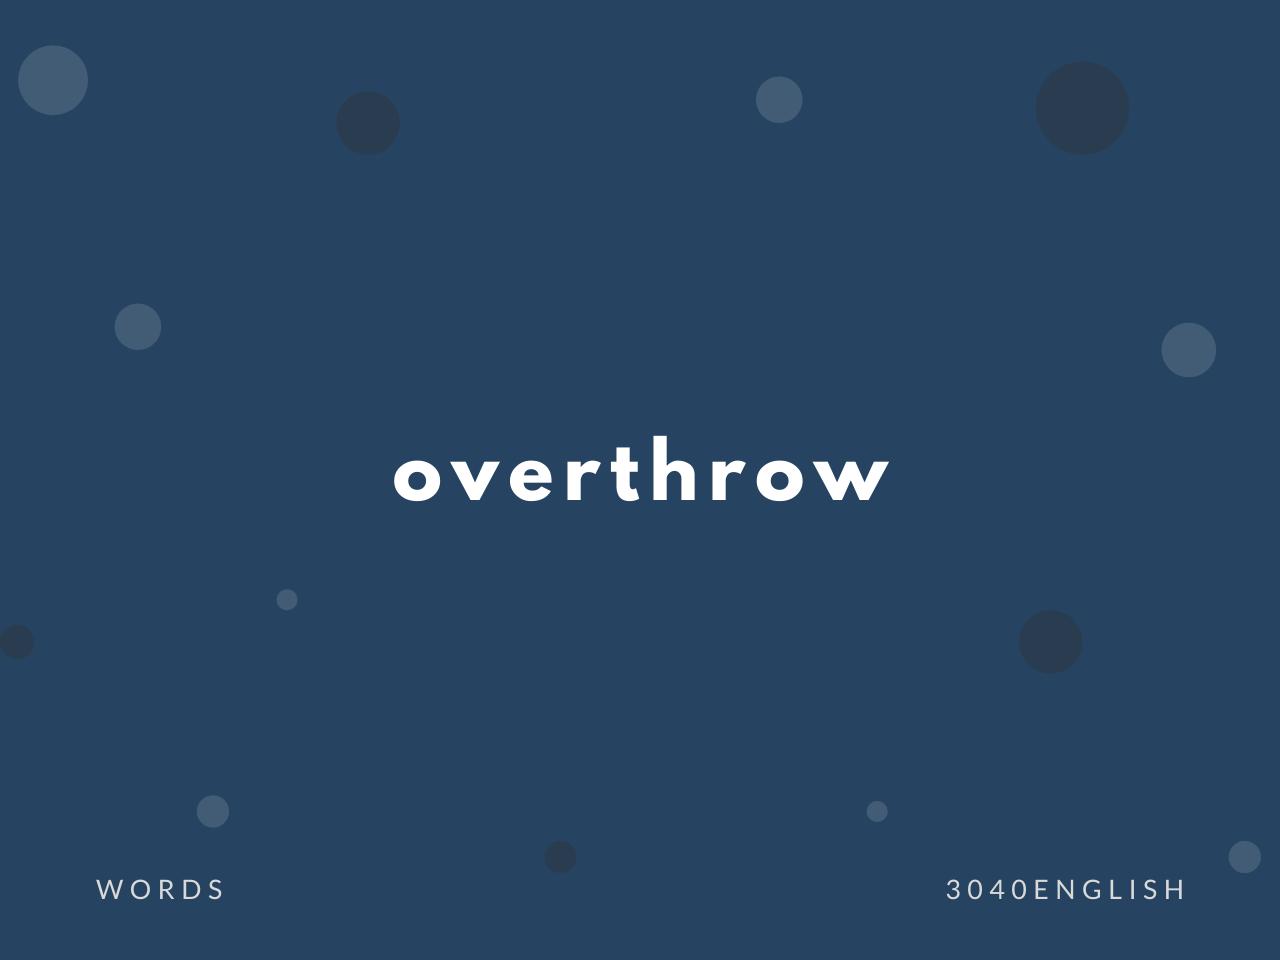 overthrow の意味と簡単な使い方【音読用例文あり】